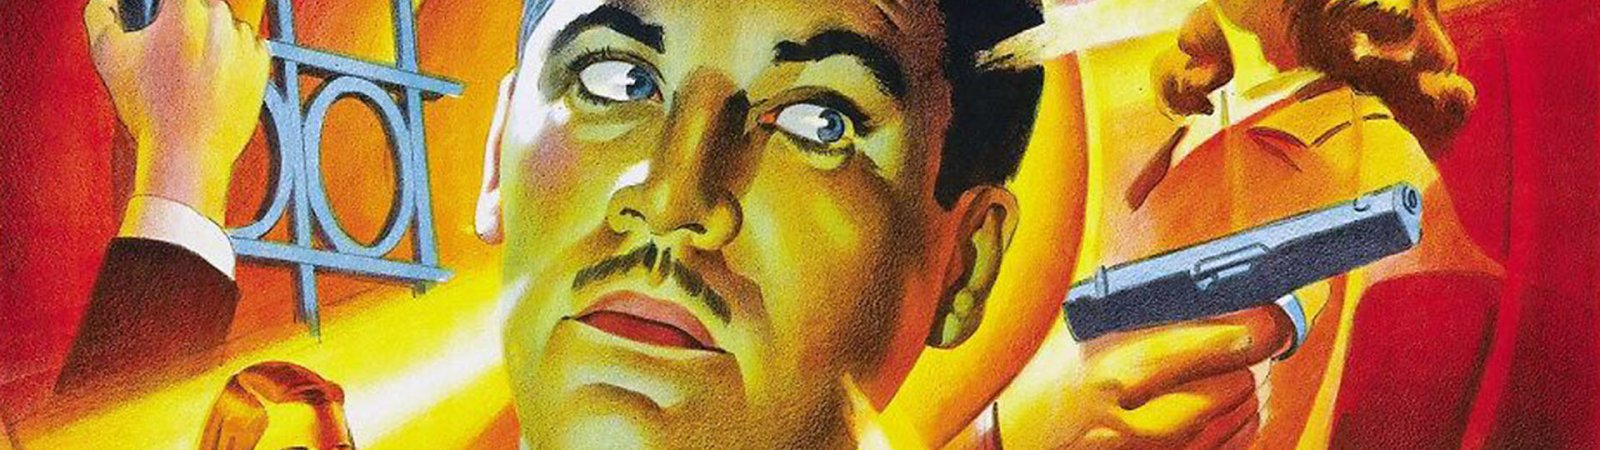 Photo dernier film Joseph L. Mankiewicz